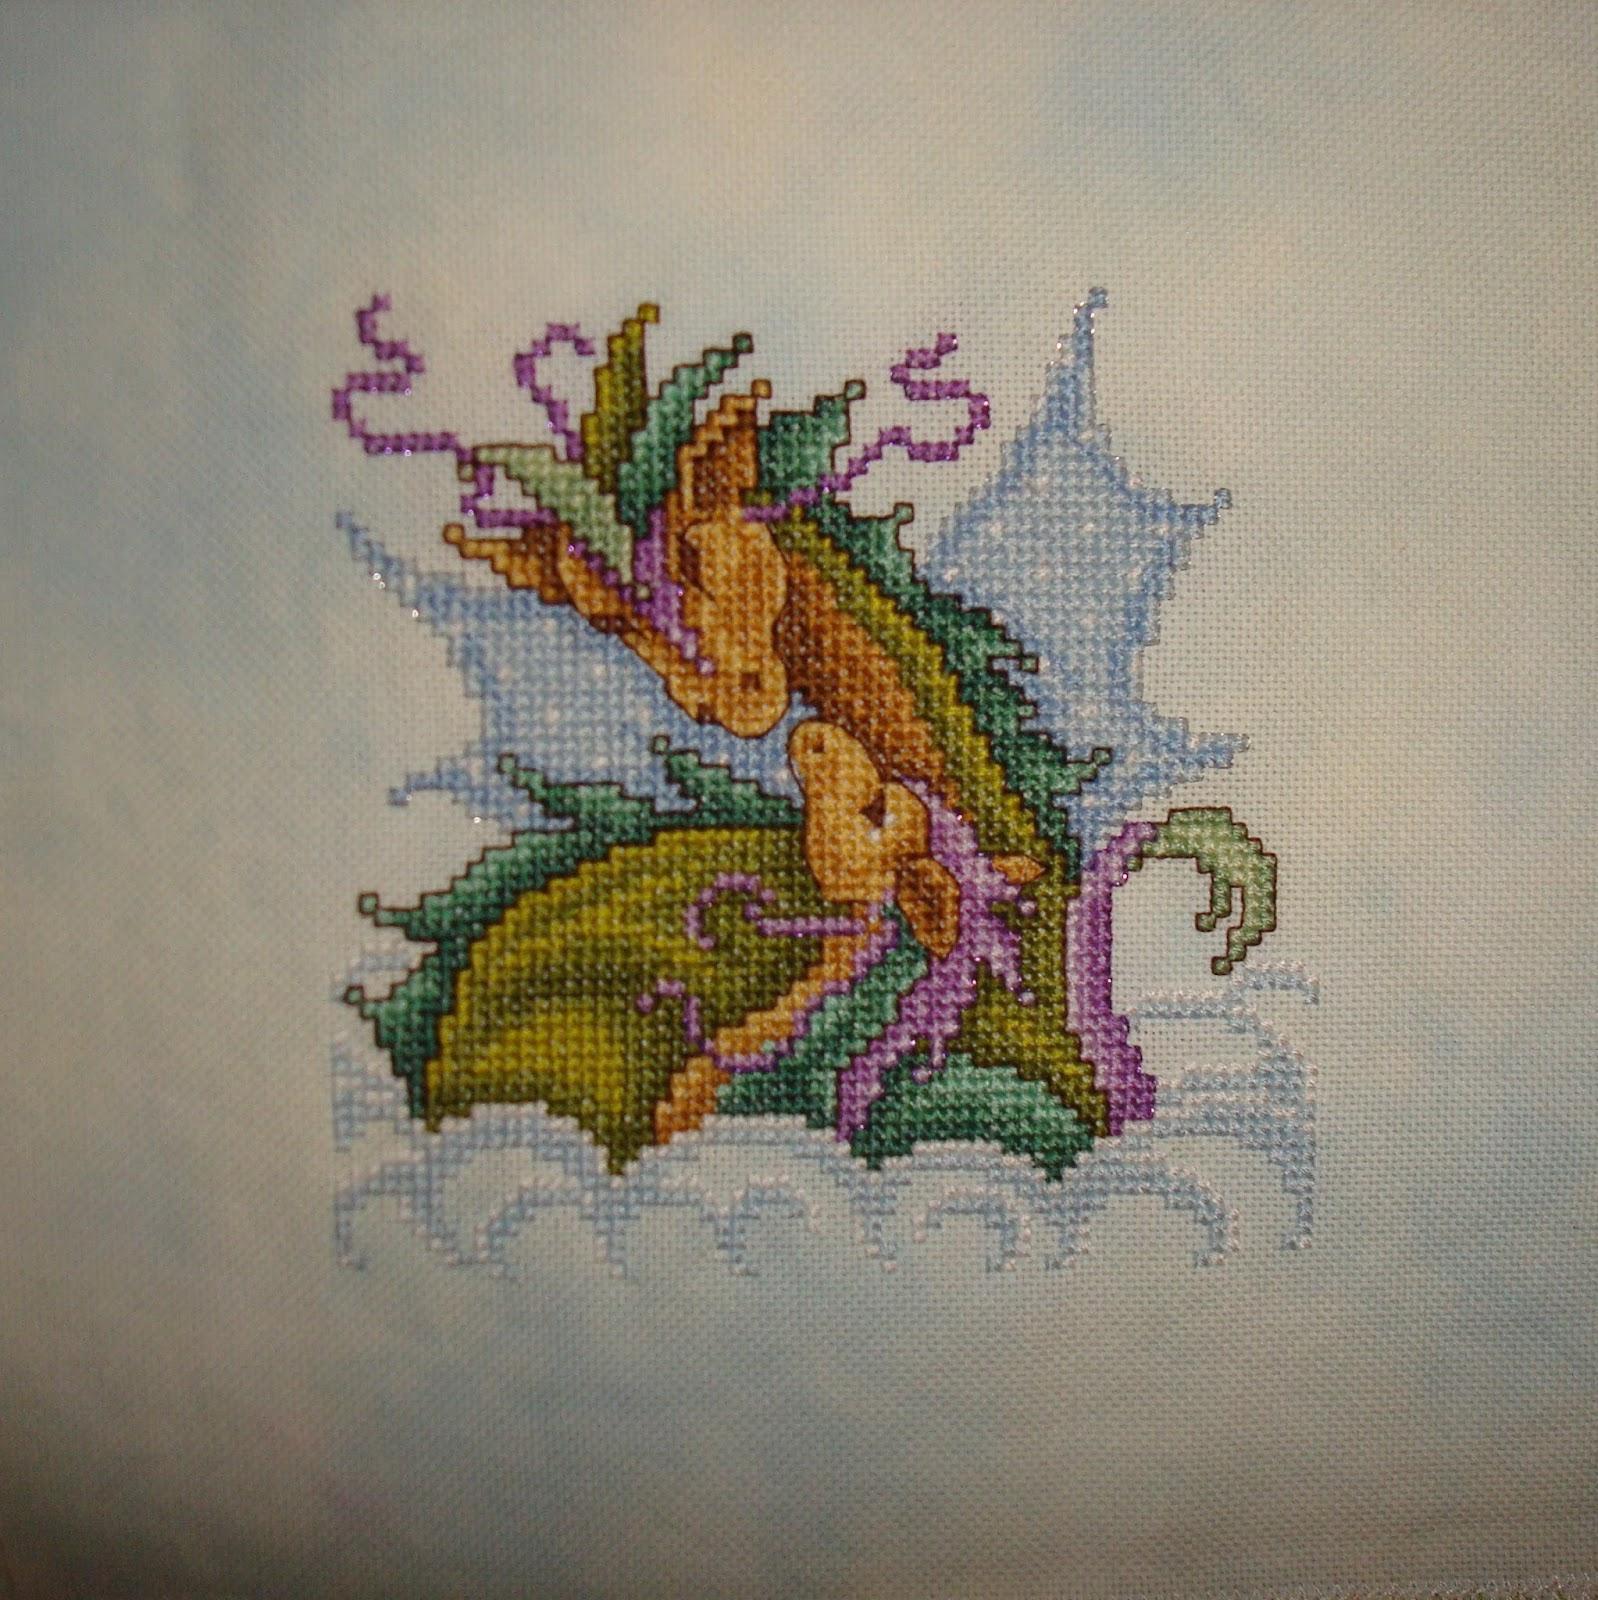 needlepoint stitches stitch diagrams 1999 saab 9 3 wiring diagram serendipitous stitching weekend